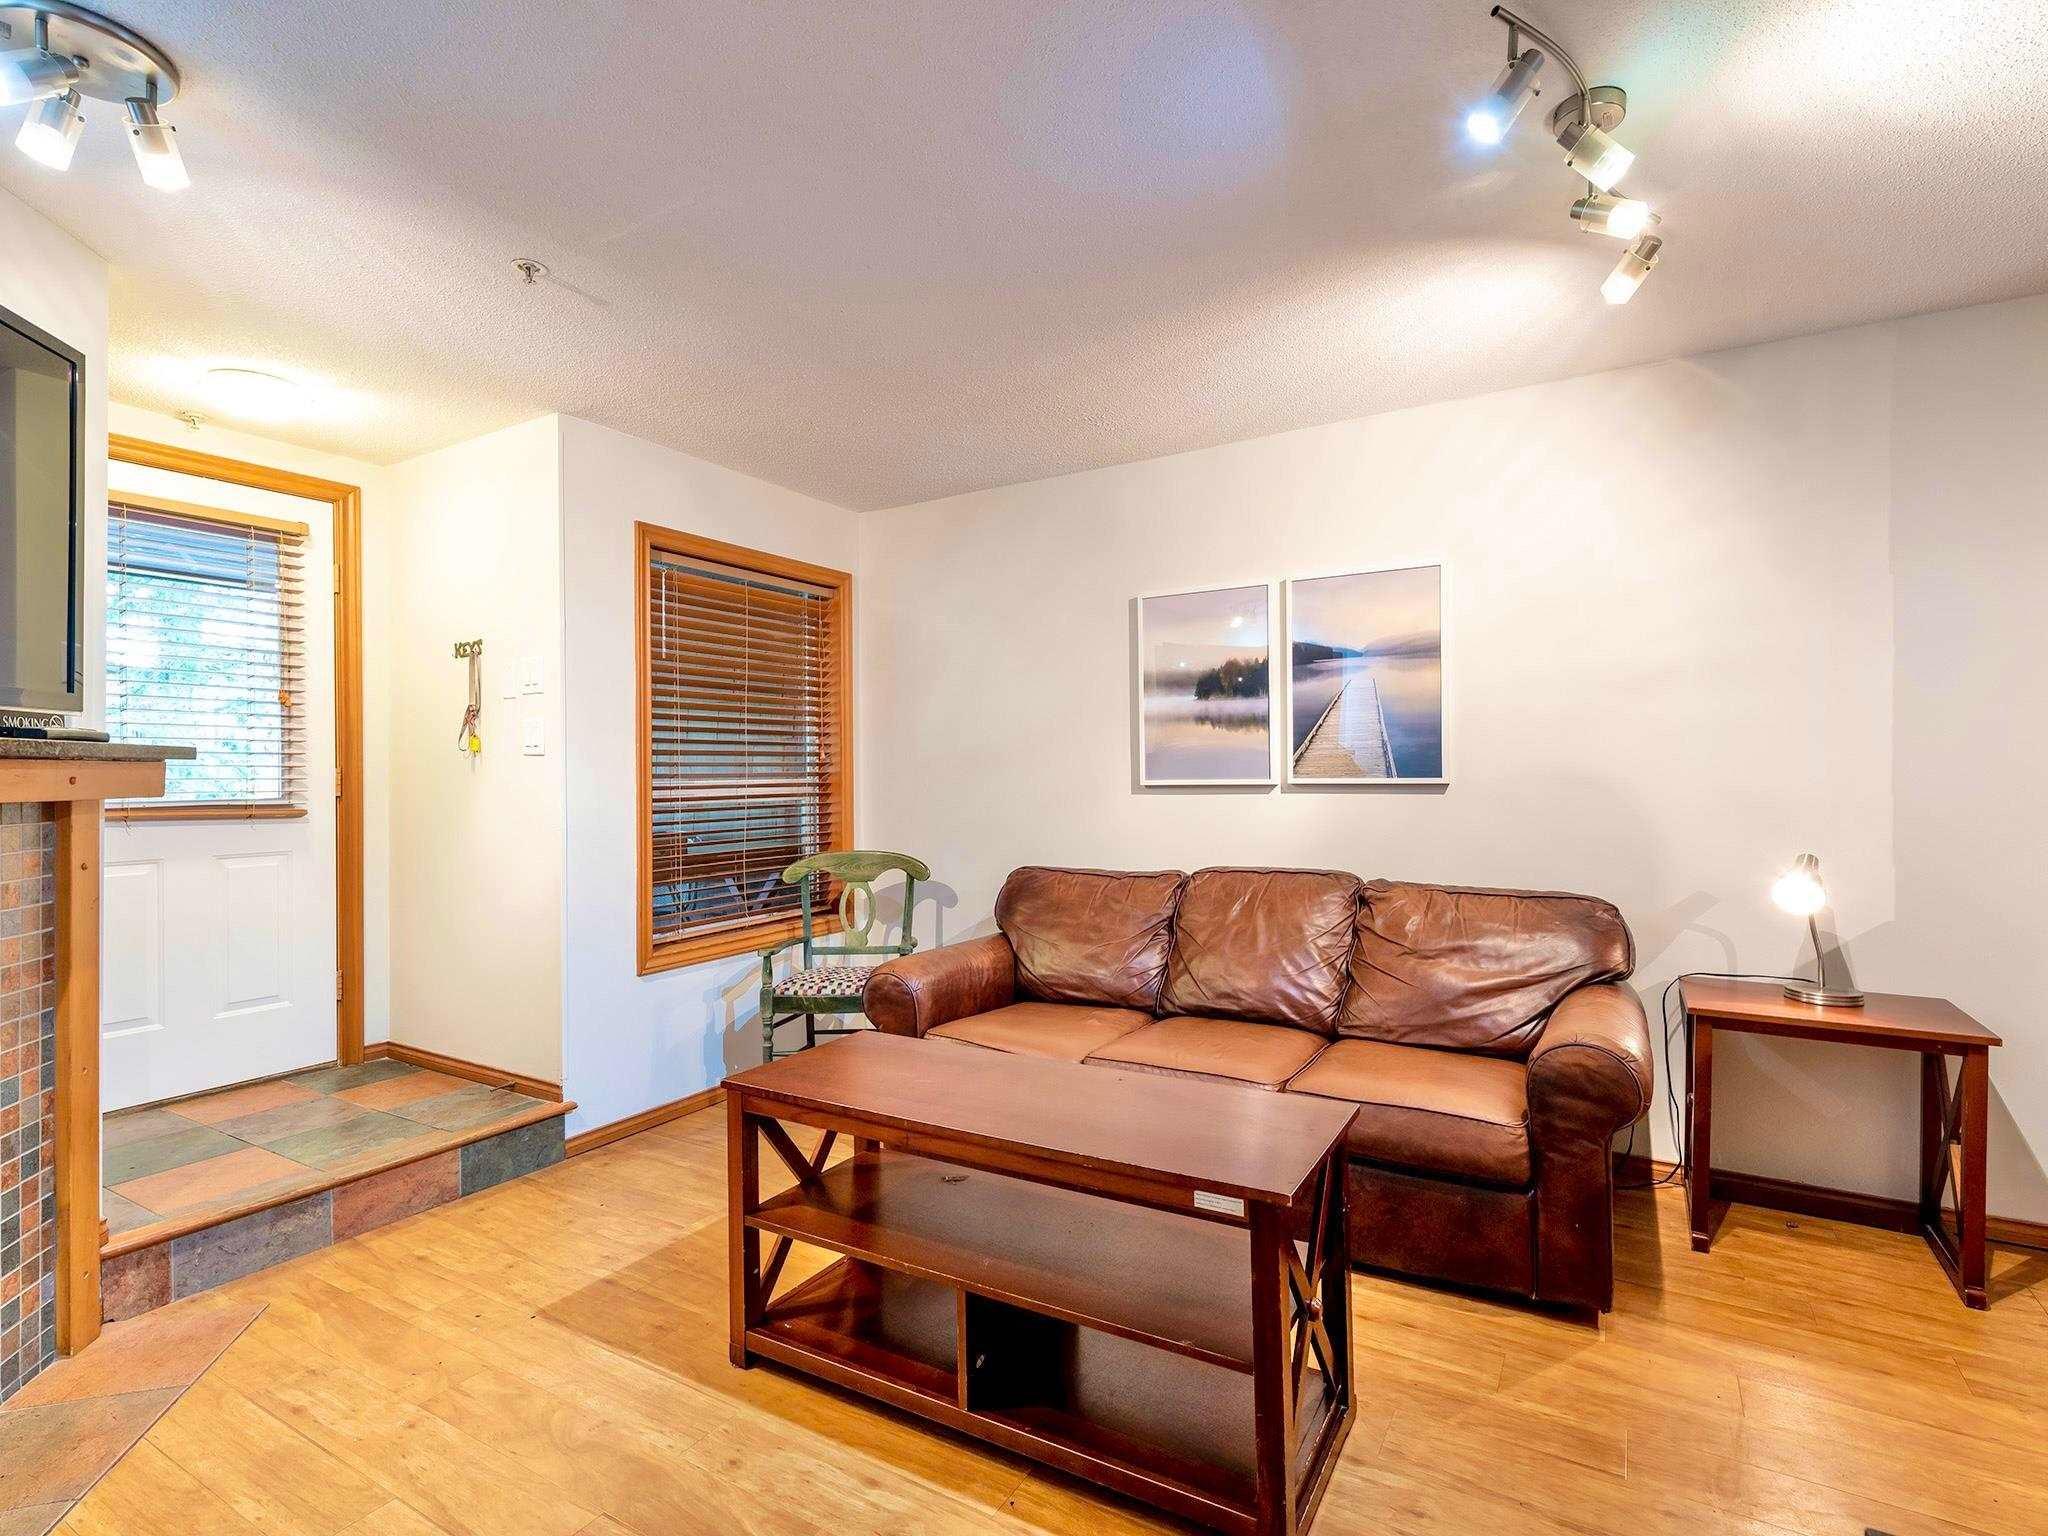 73 4388 NORTHLANDS BOULEVARD - Whistler Village Townhouse for sale, 2 Bedrooms (R2580863) - #2